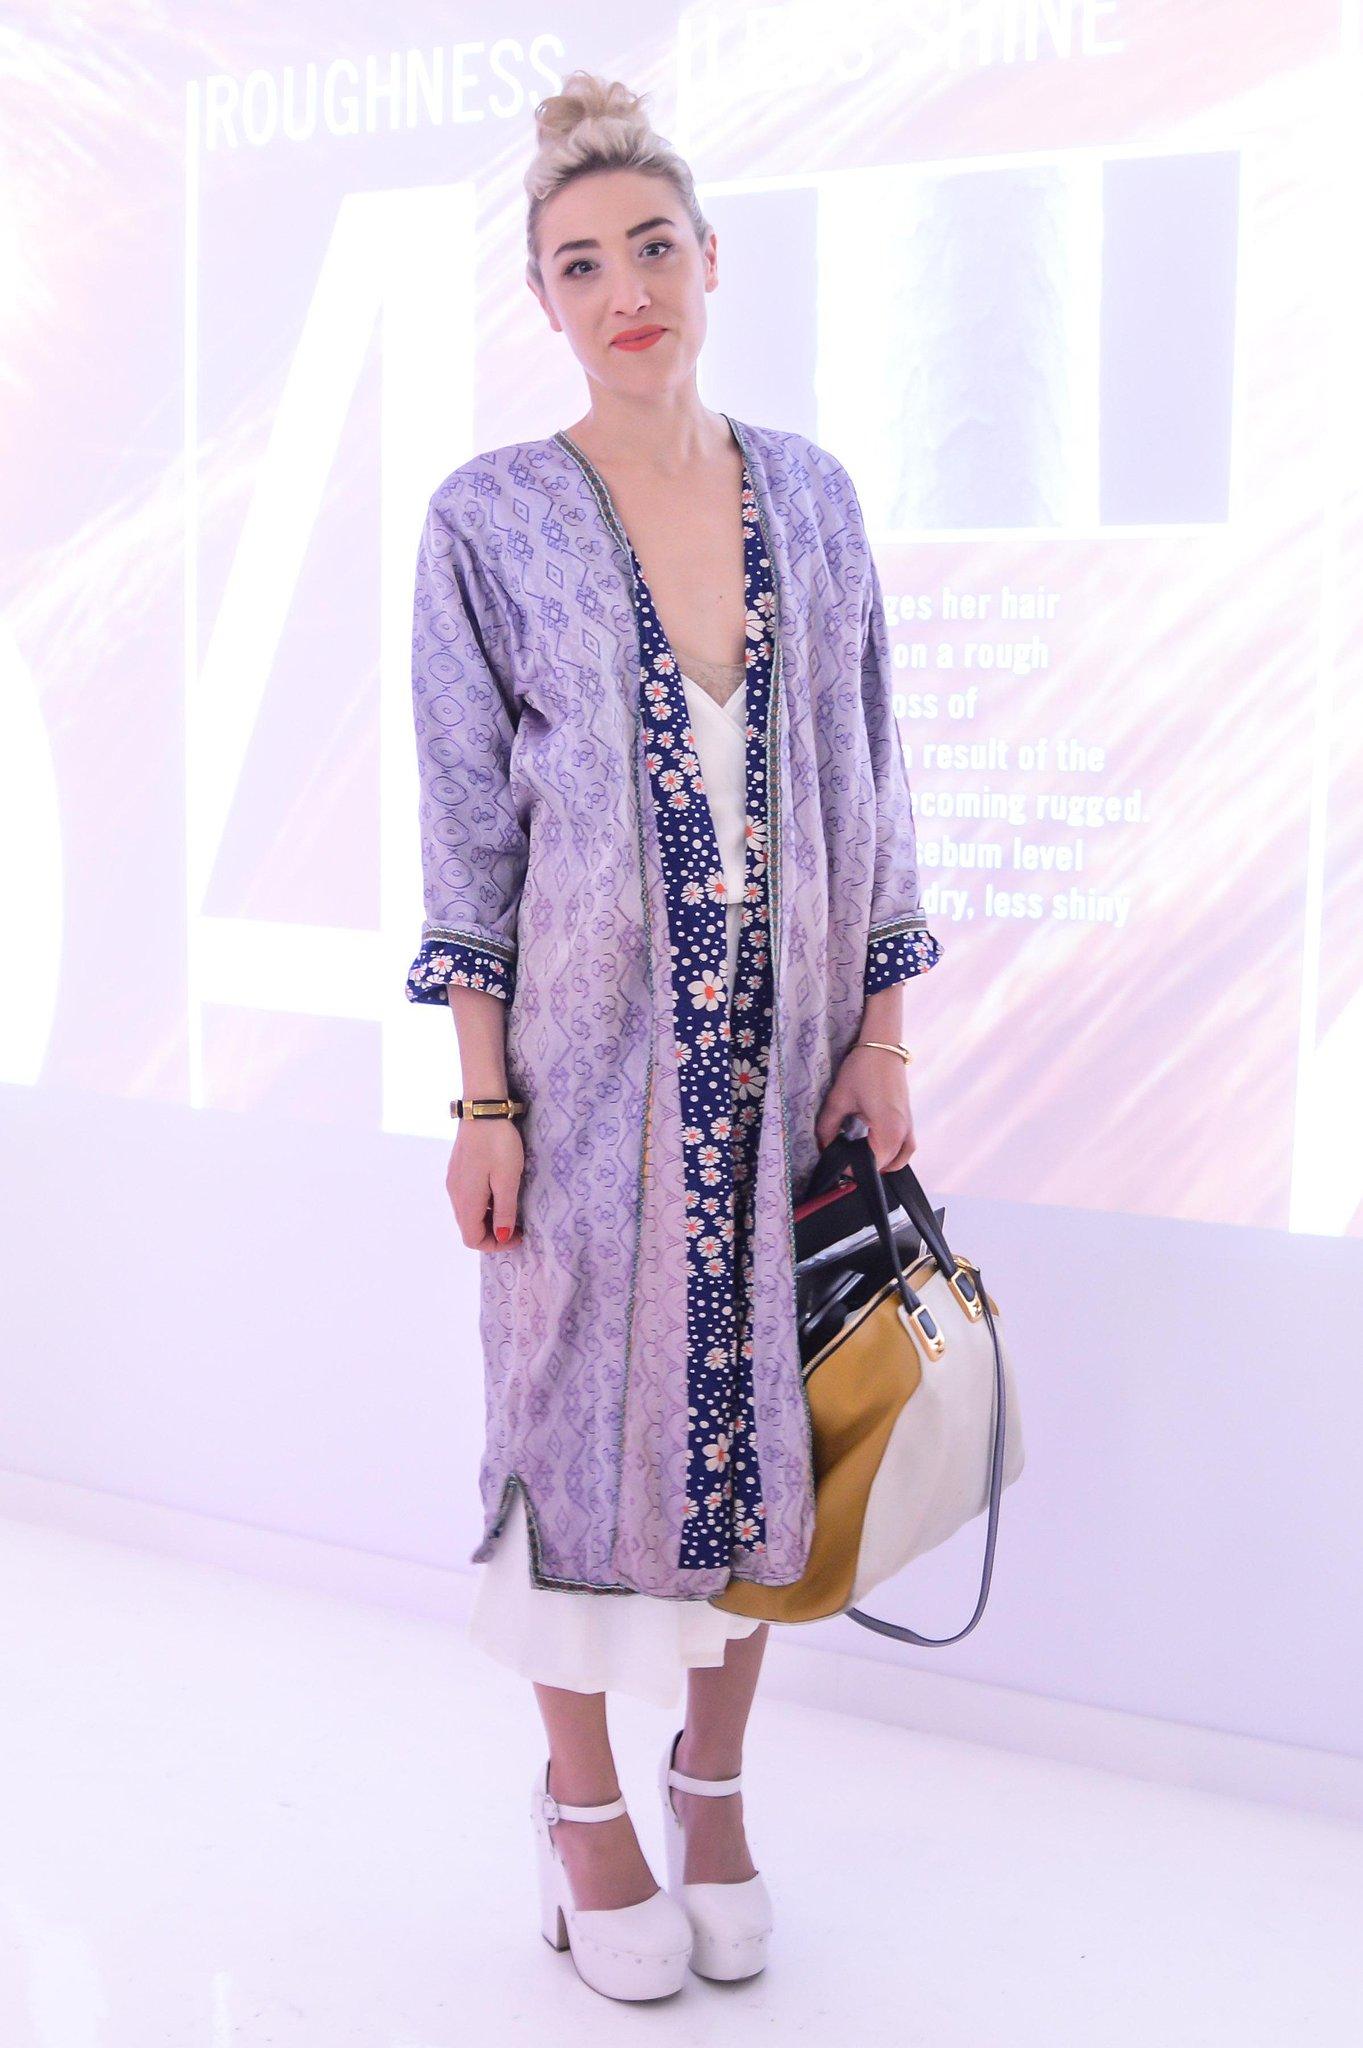 Mia Moretti at the Nexxus Art & Science of Hair Exhibition opening in New York. Source: Joe Schildhorn/BFAnyc.com